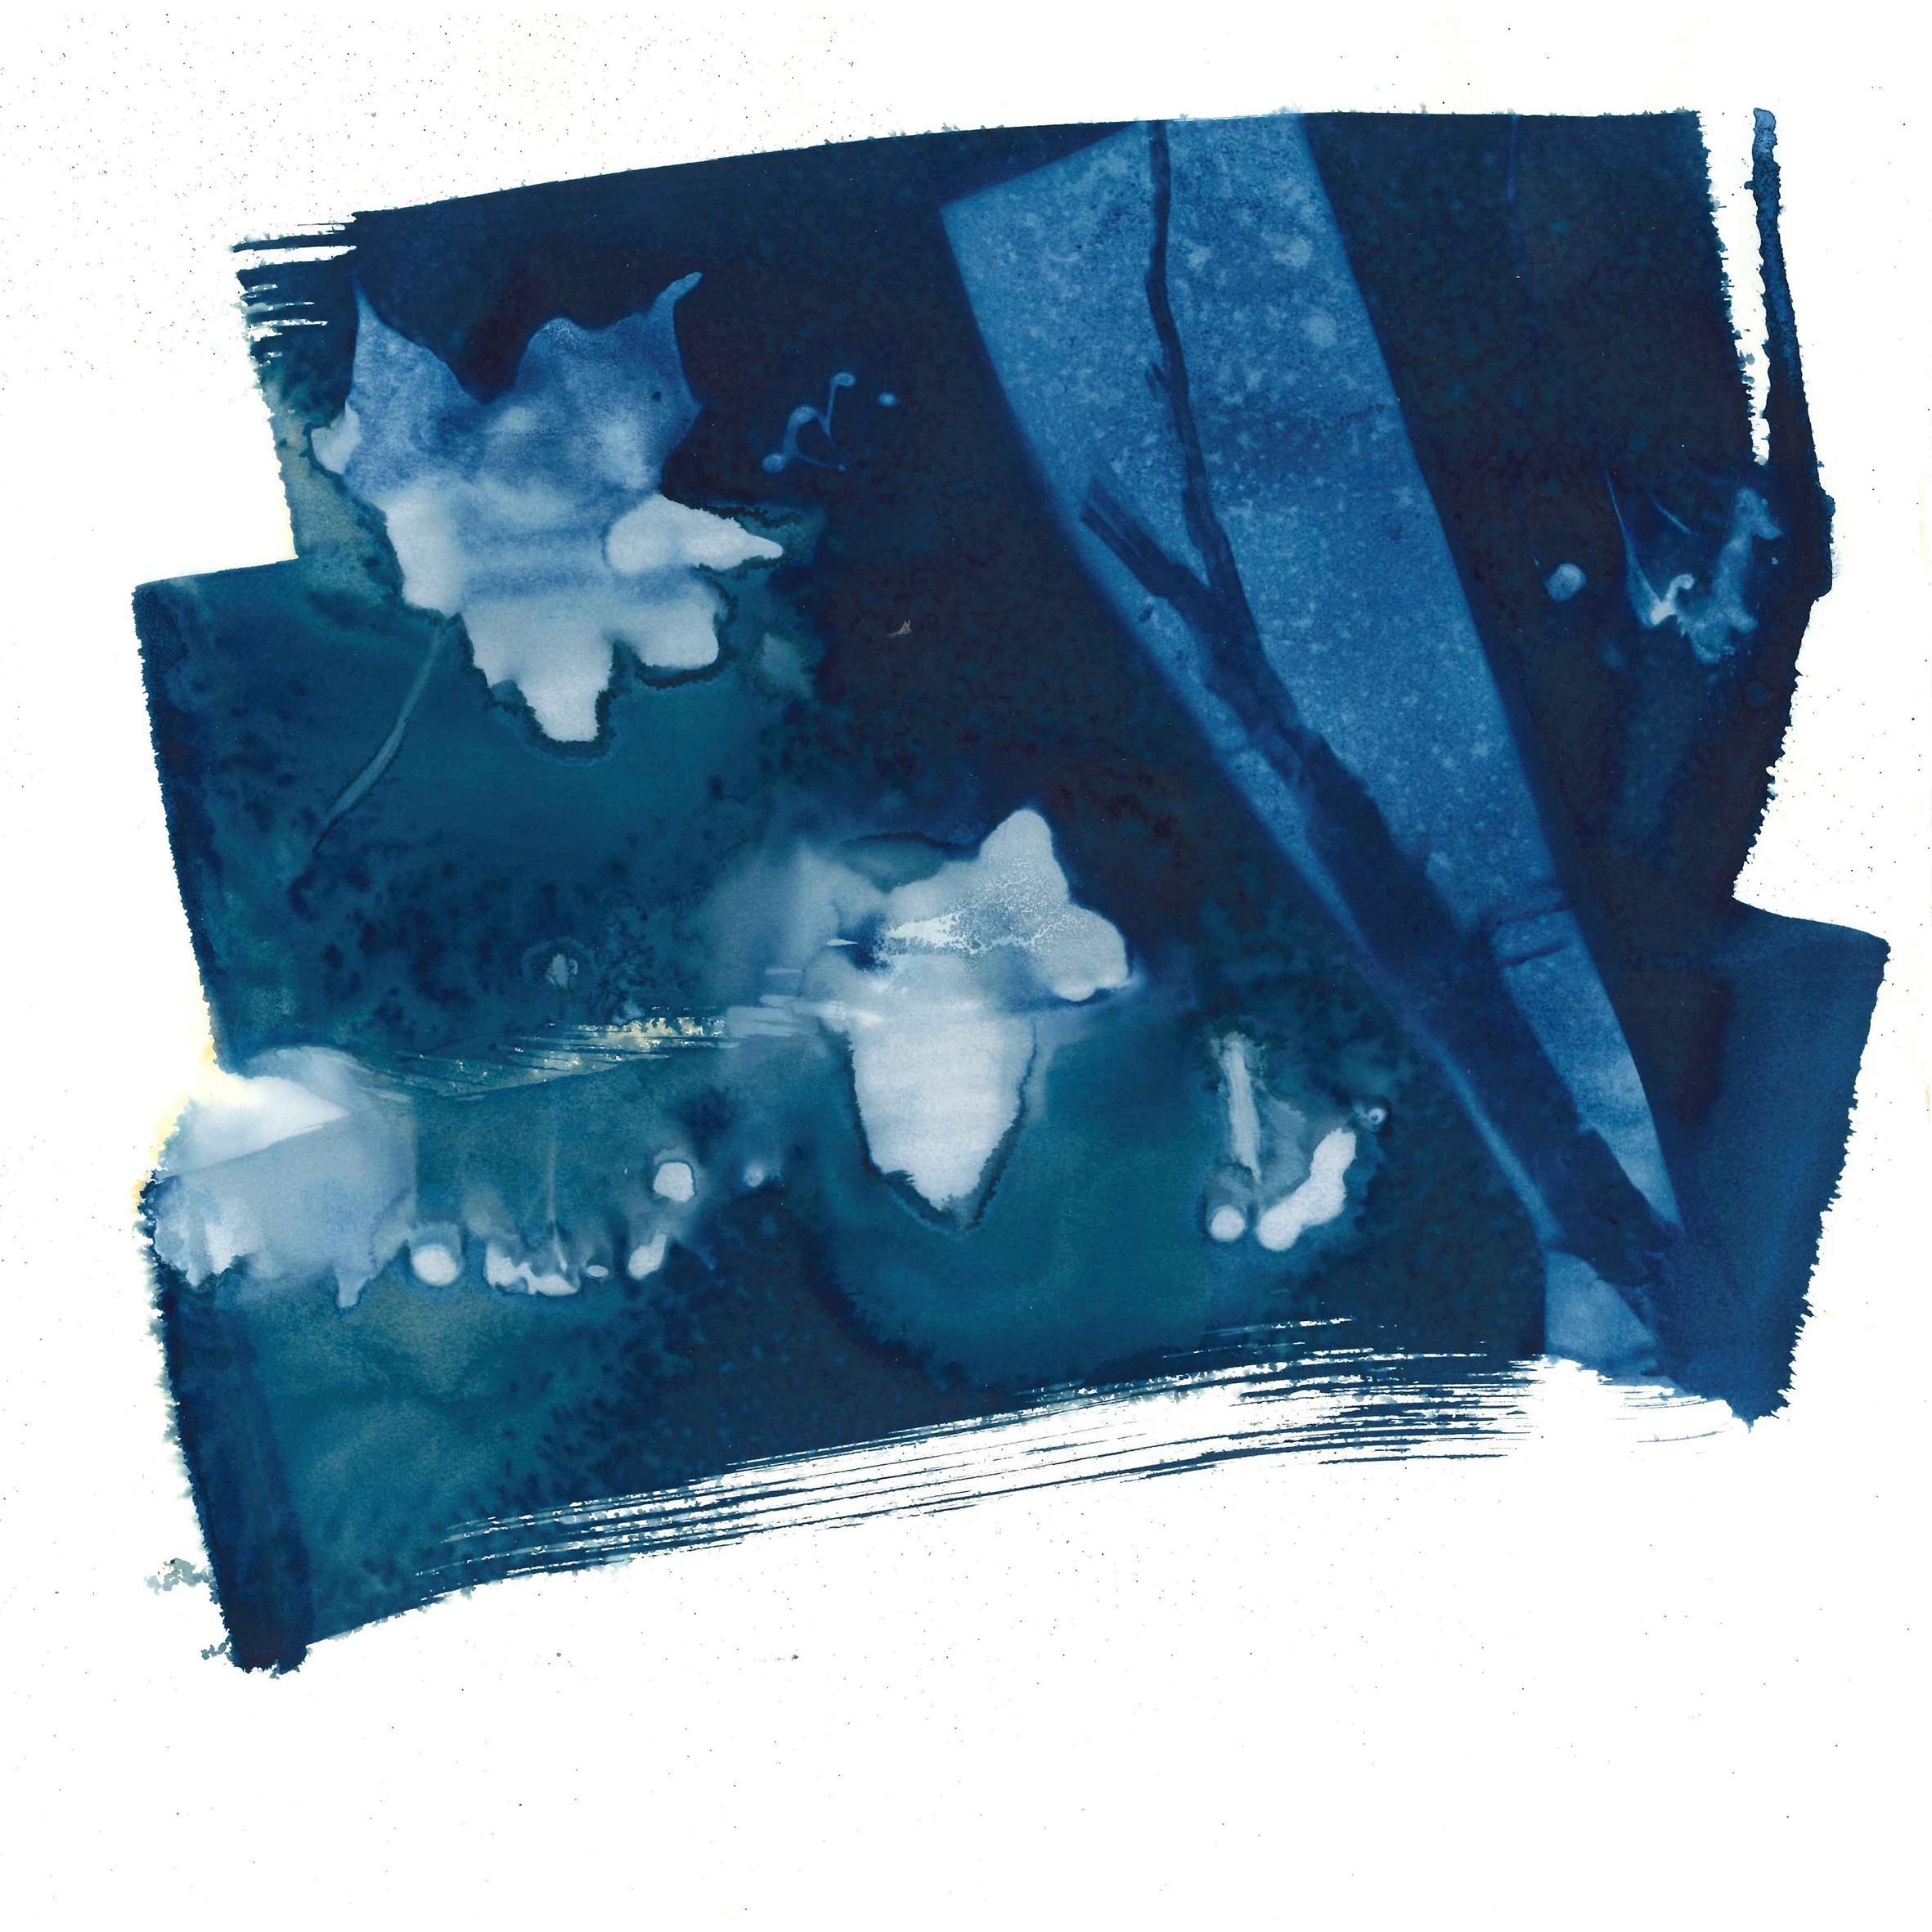 JM afbeelding 26.jpg